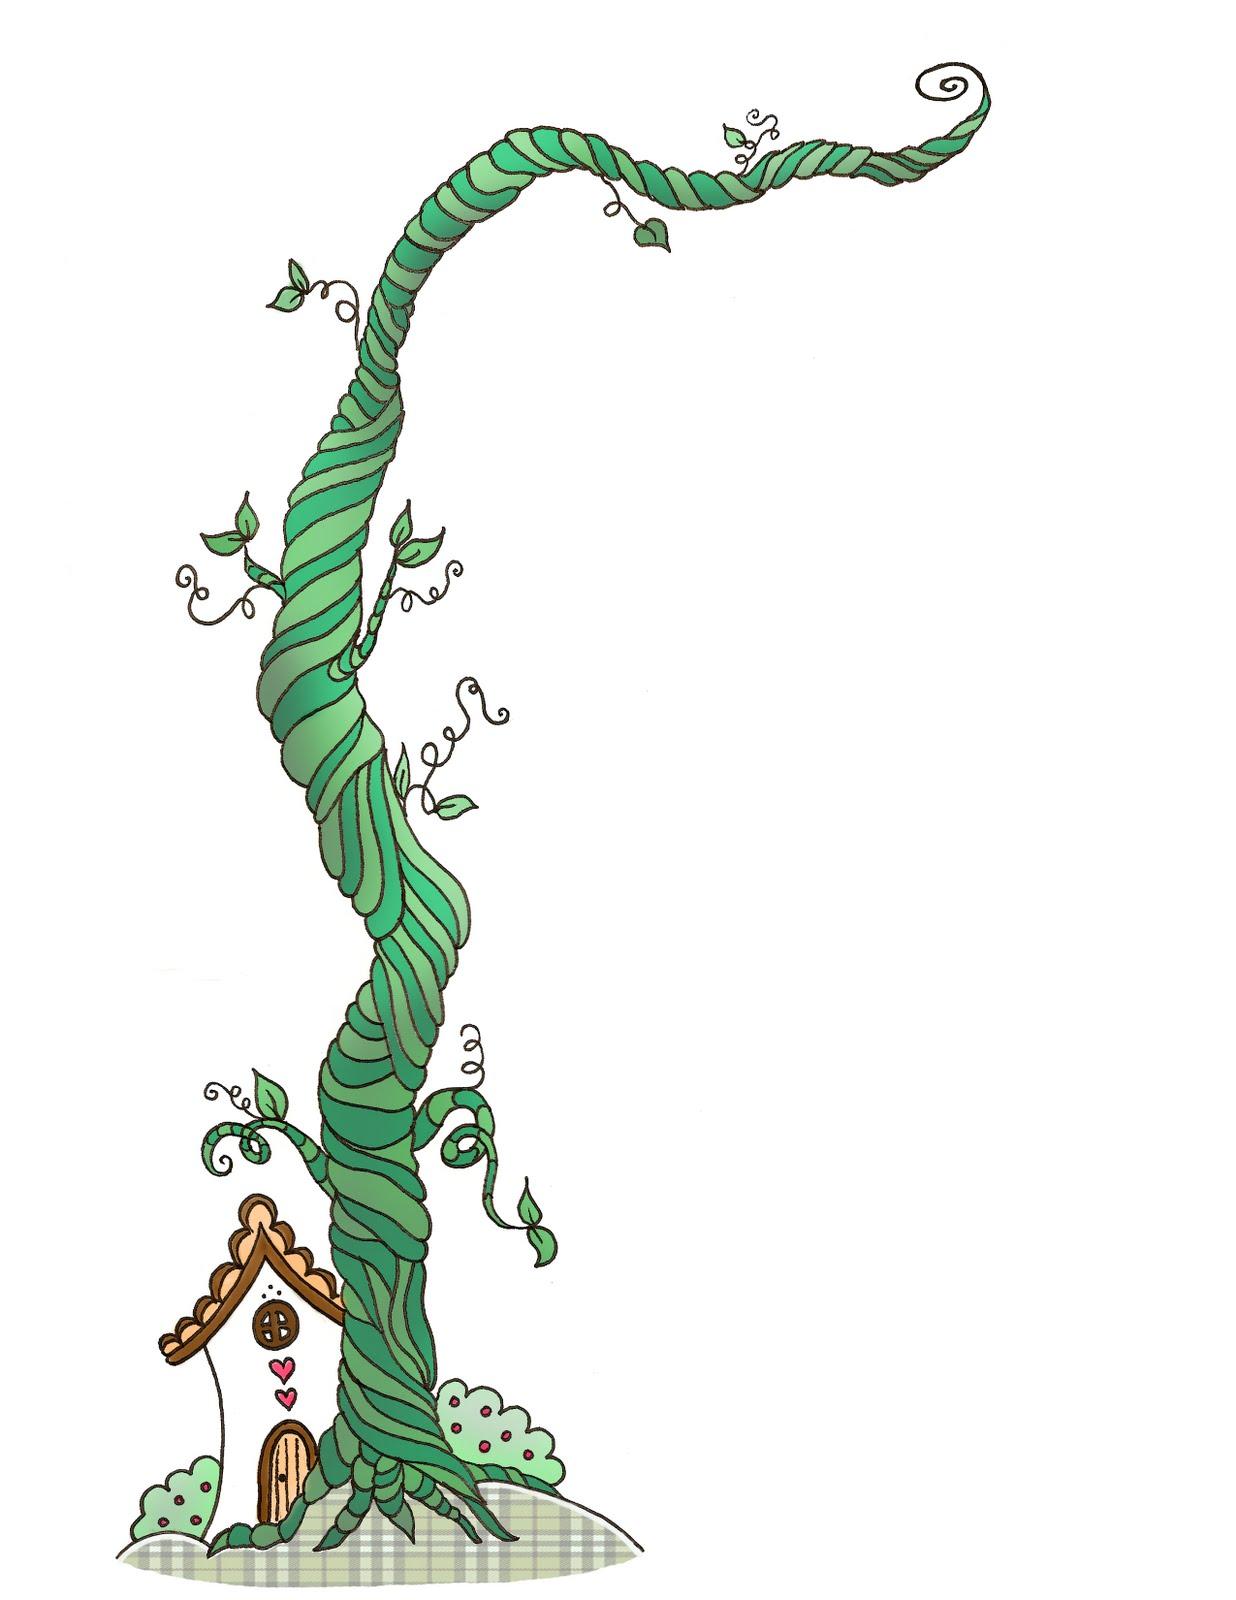 Jack Beanstalk Clip Art N3 Free Image